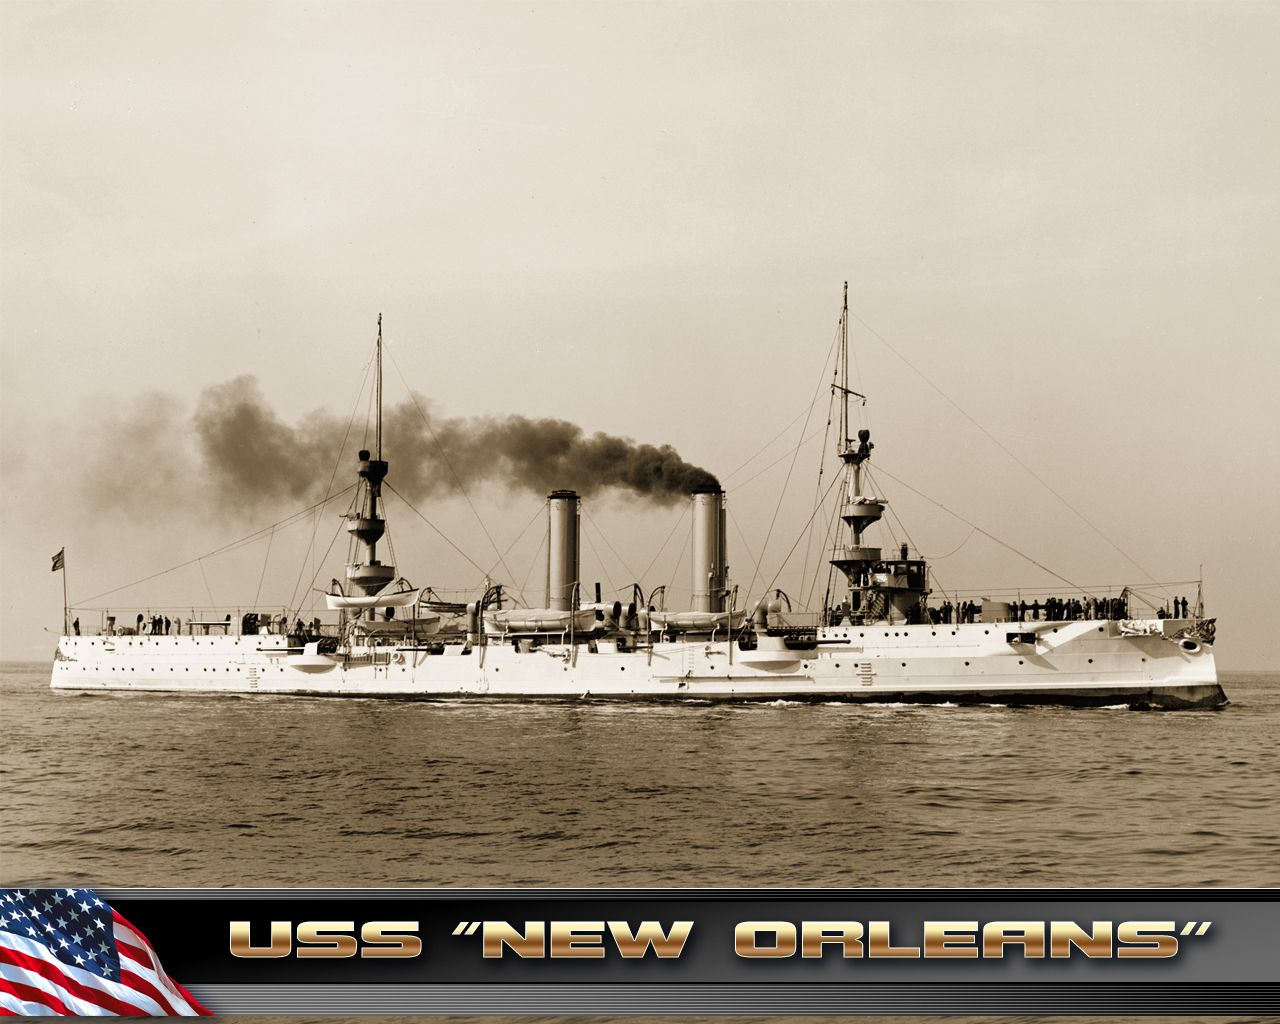 USS NEW ORLEANS light cruiser 1898